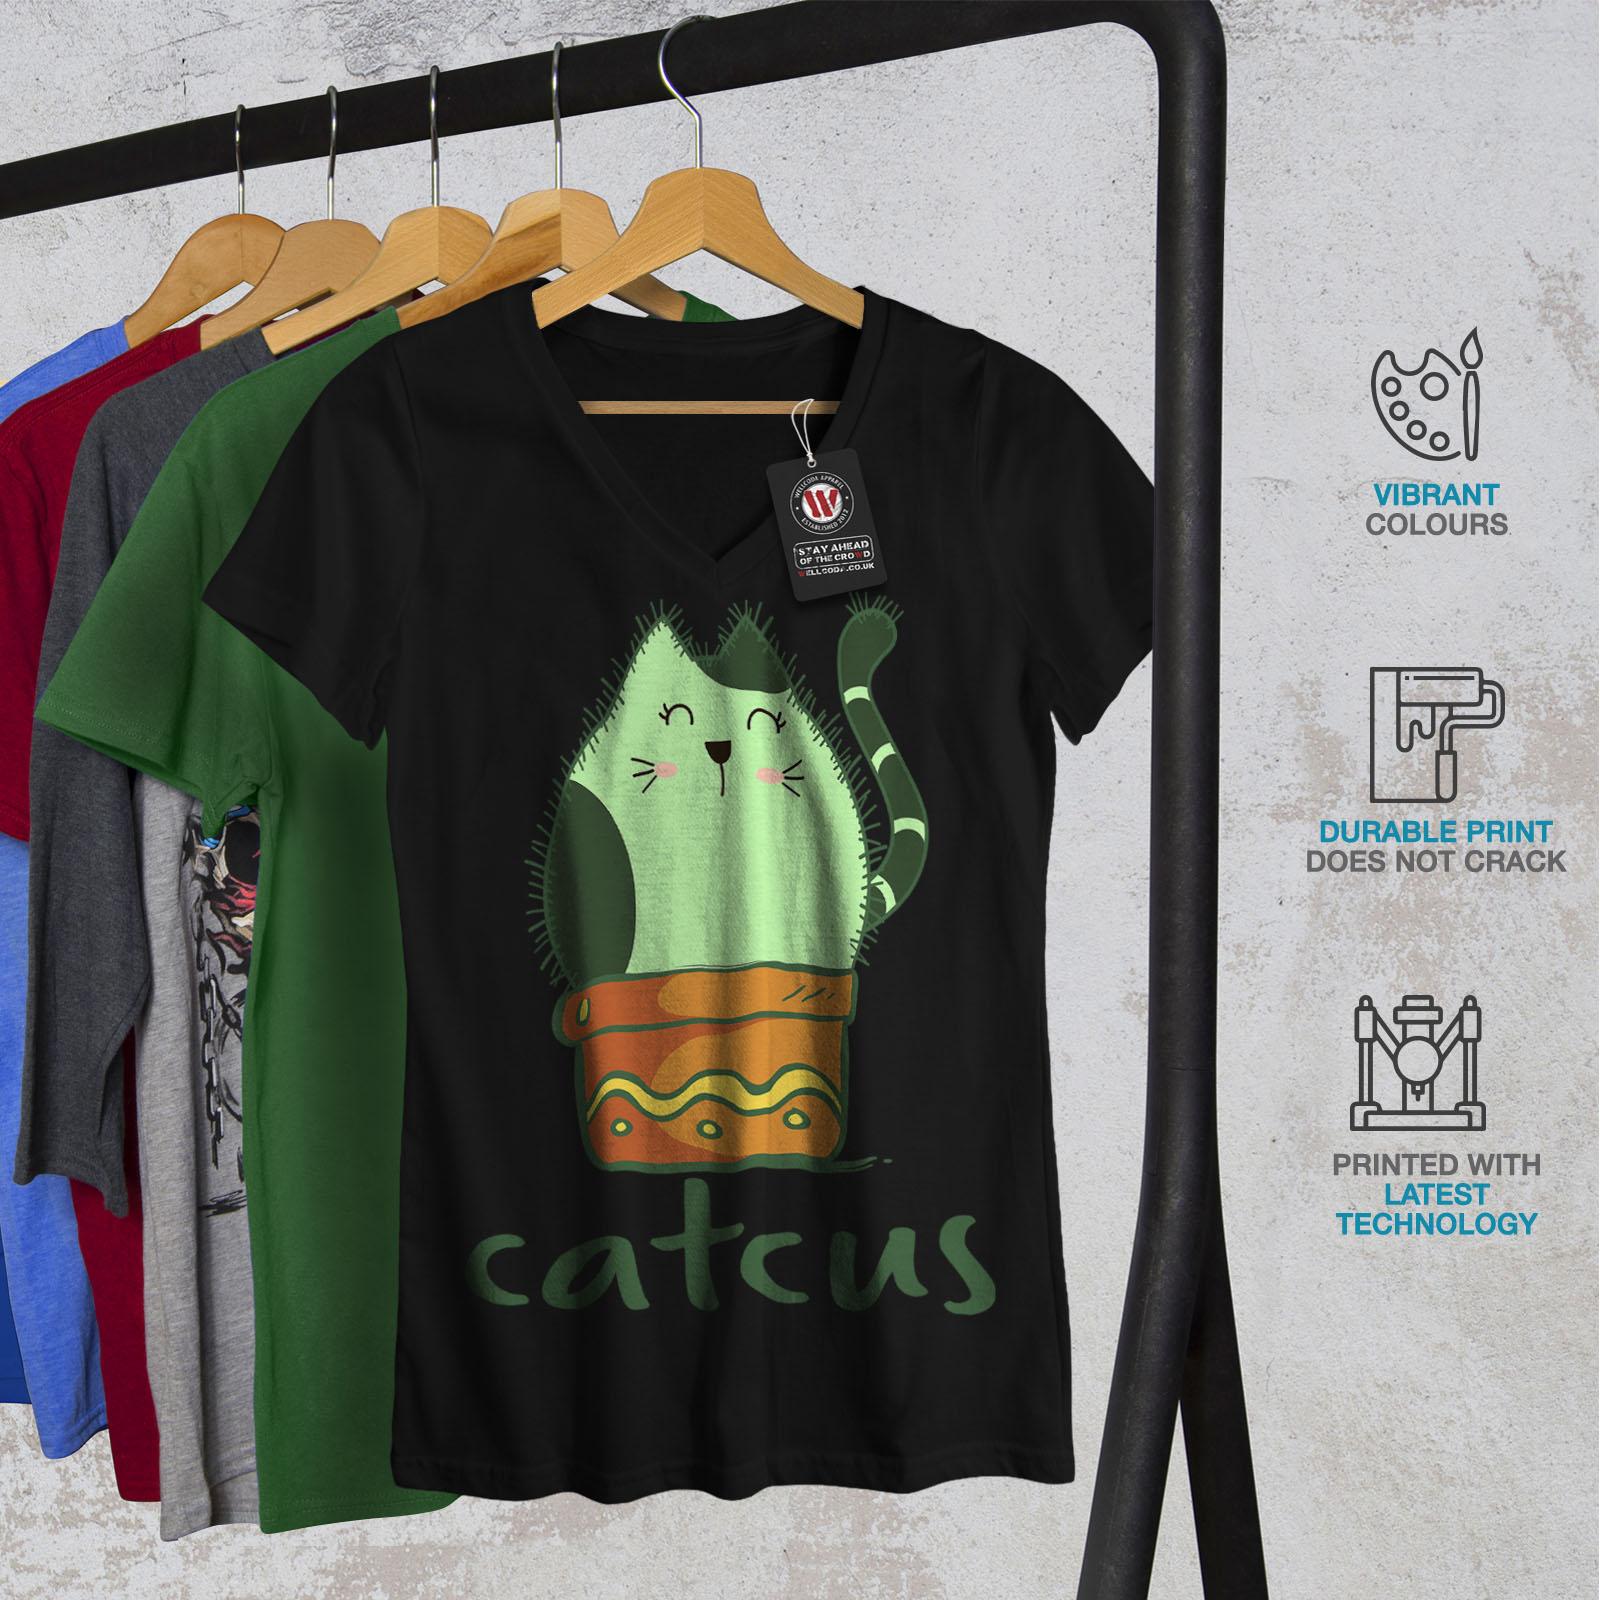 Wellcoda-Cat-Cactus-Womens-V-Neck-T-shirt-Funny-Animal-Graphic-Design-Tee thumbnail 4